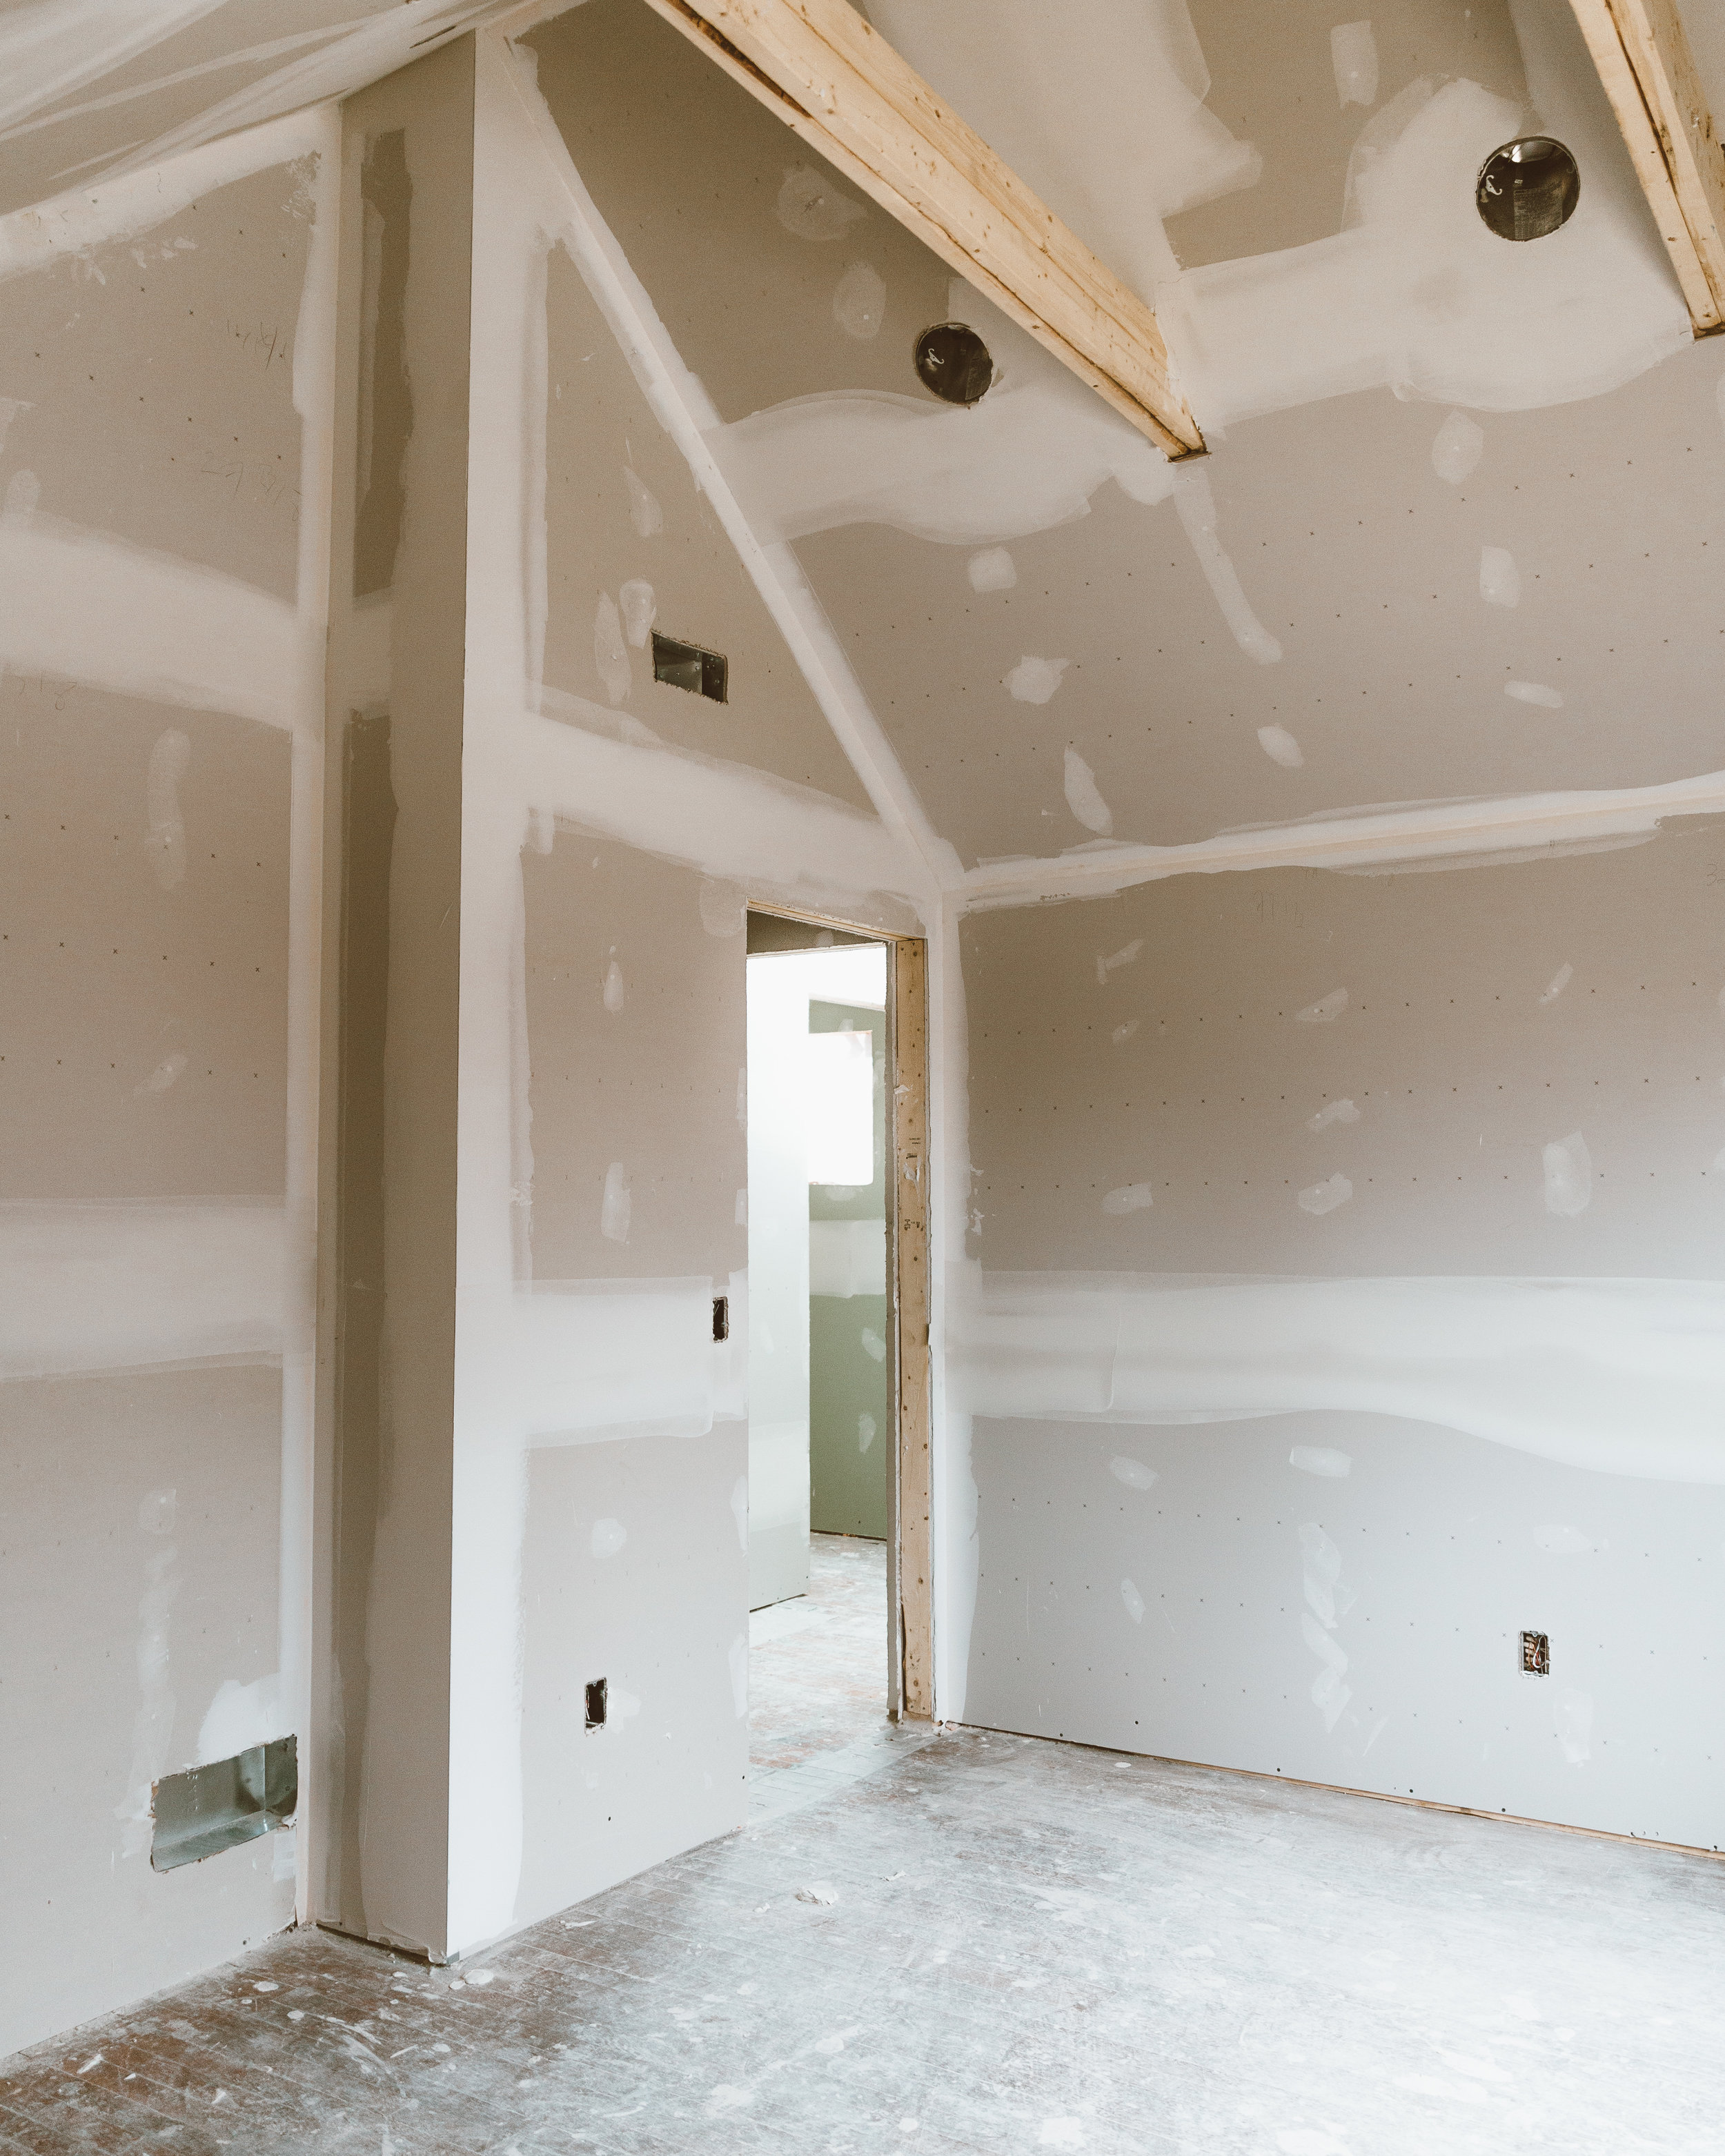 forthehome-renovation-drywall0015.jpg